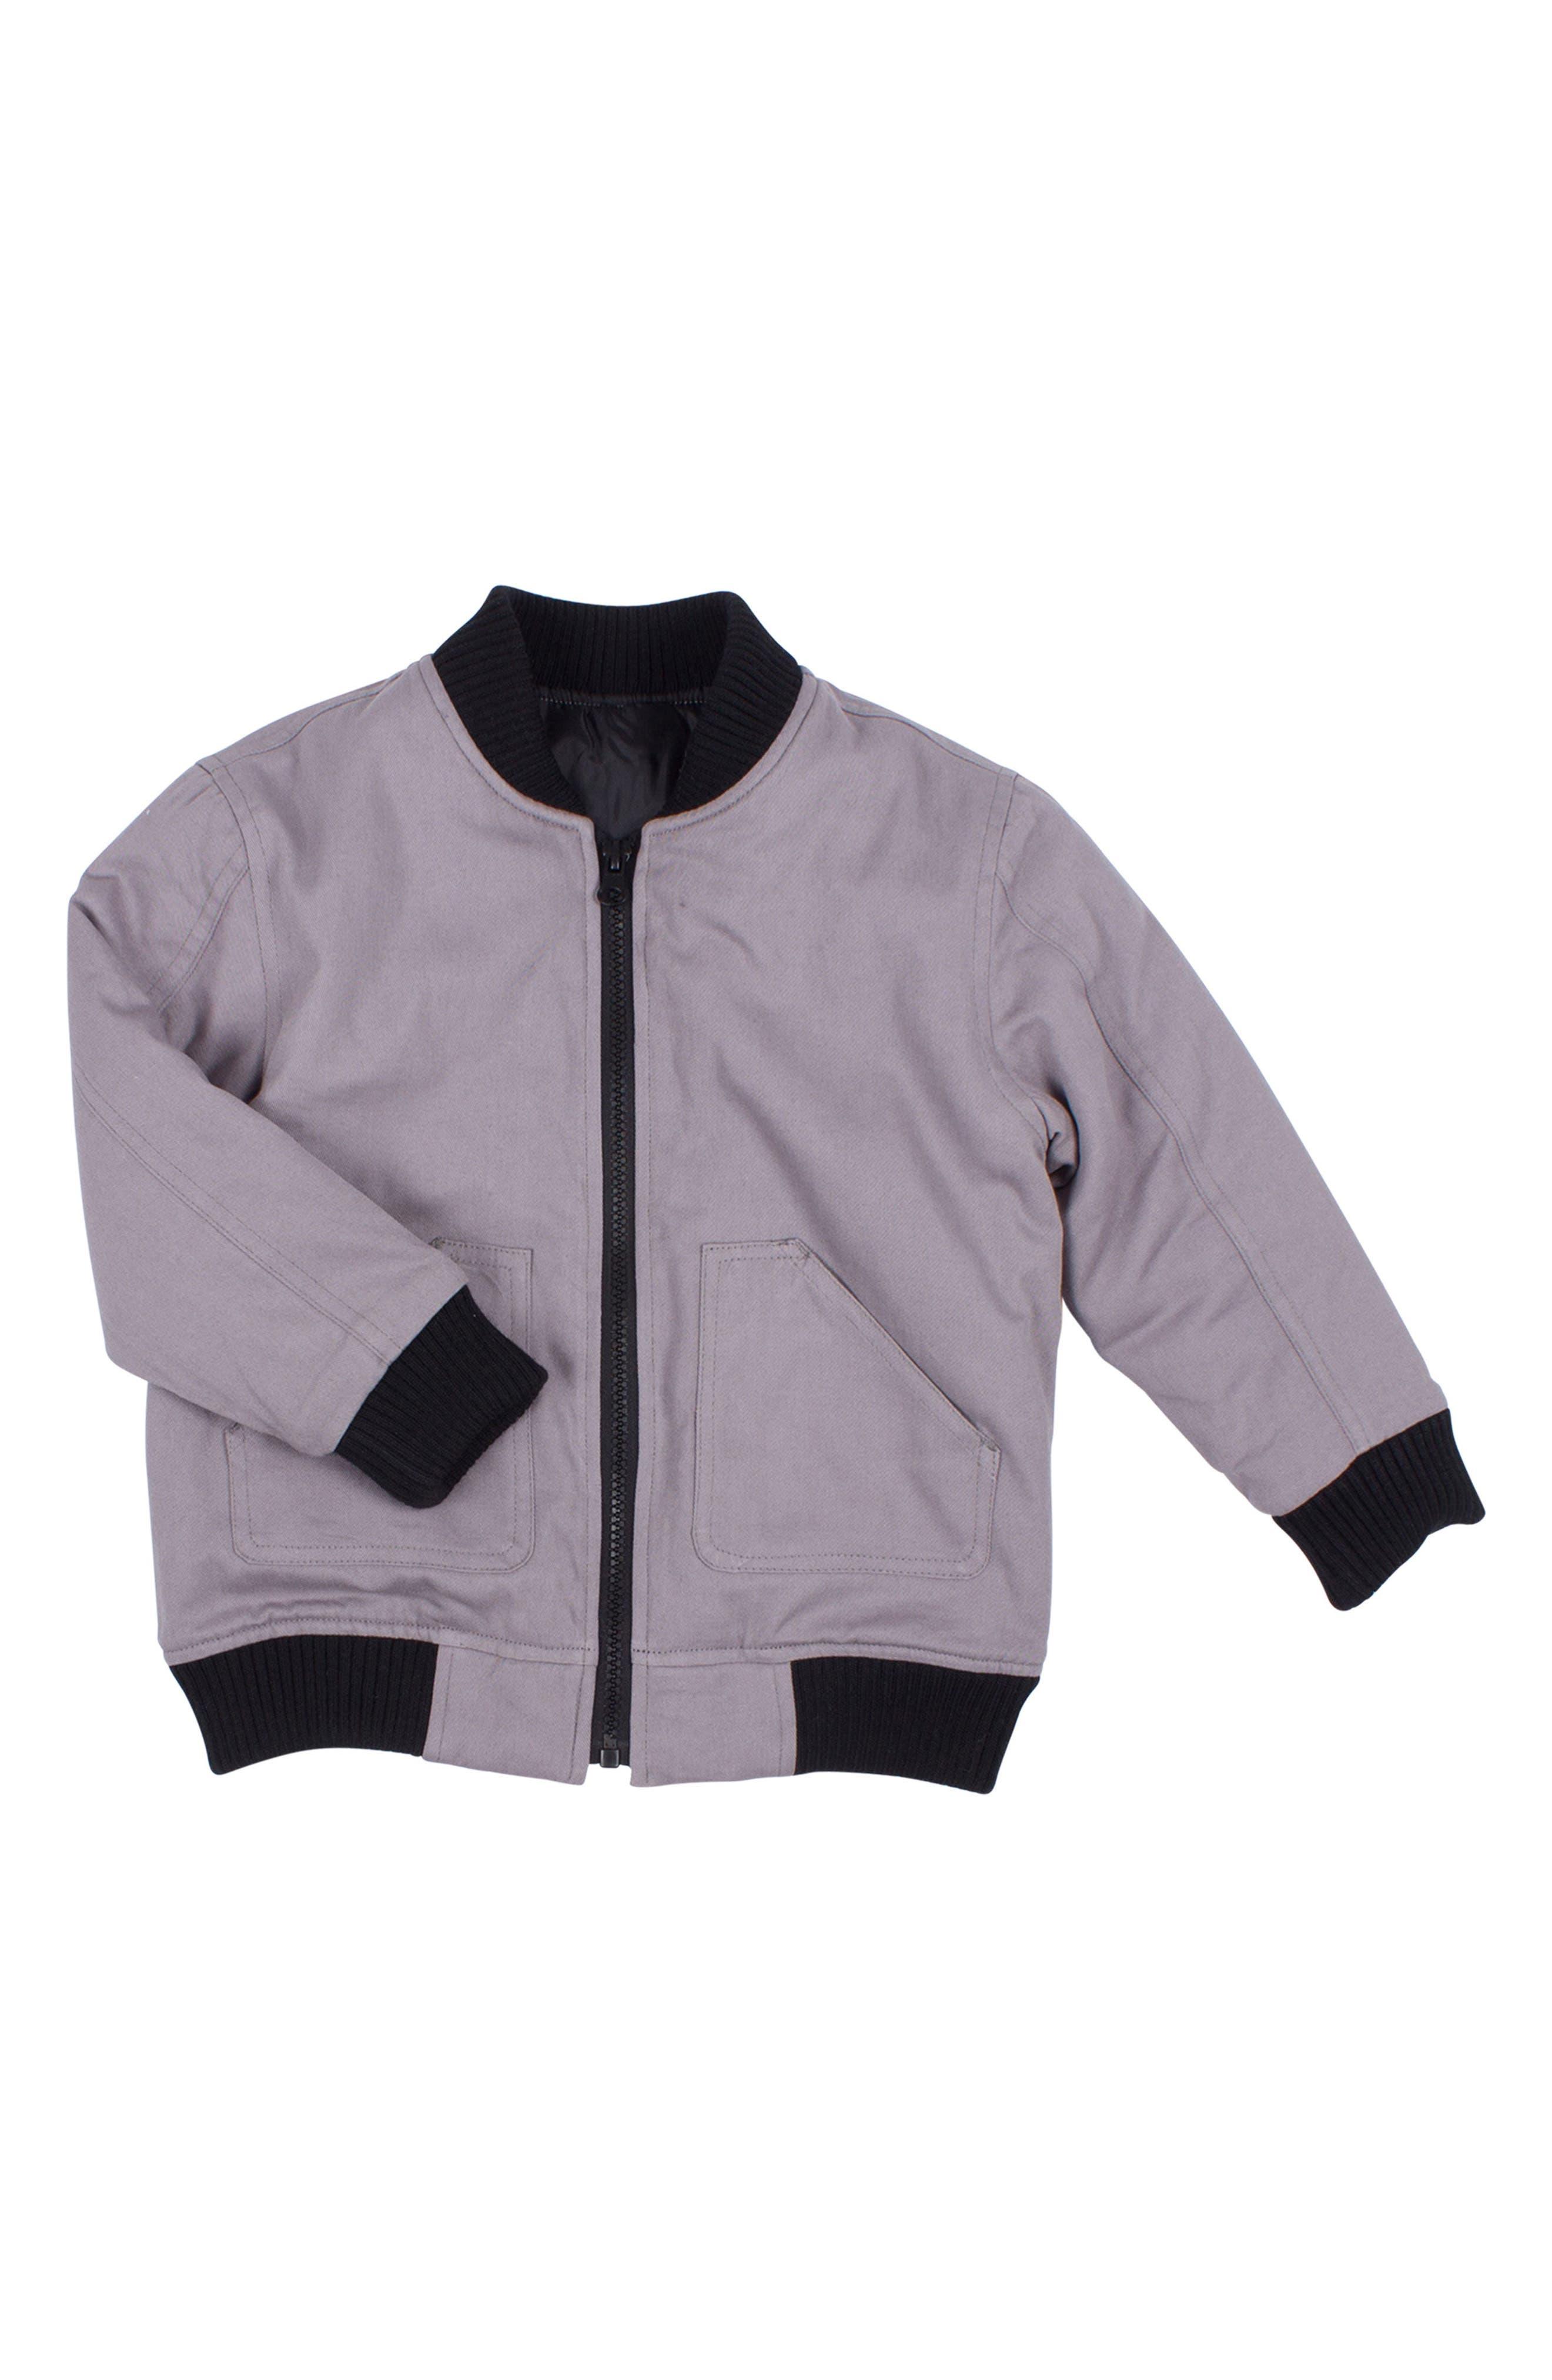 One Fine Apple Bomber Jacket,                             Main thumbnail 1, color,                             Grey